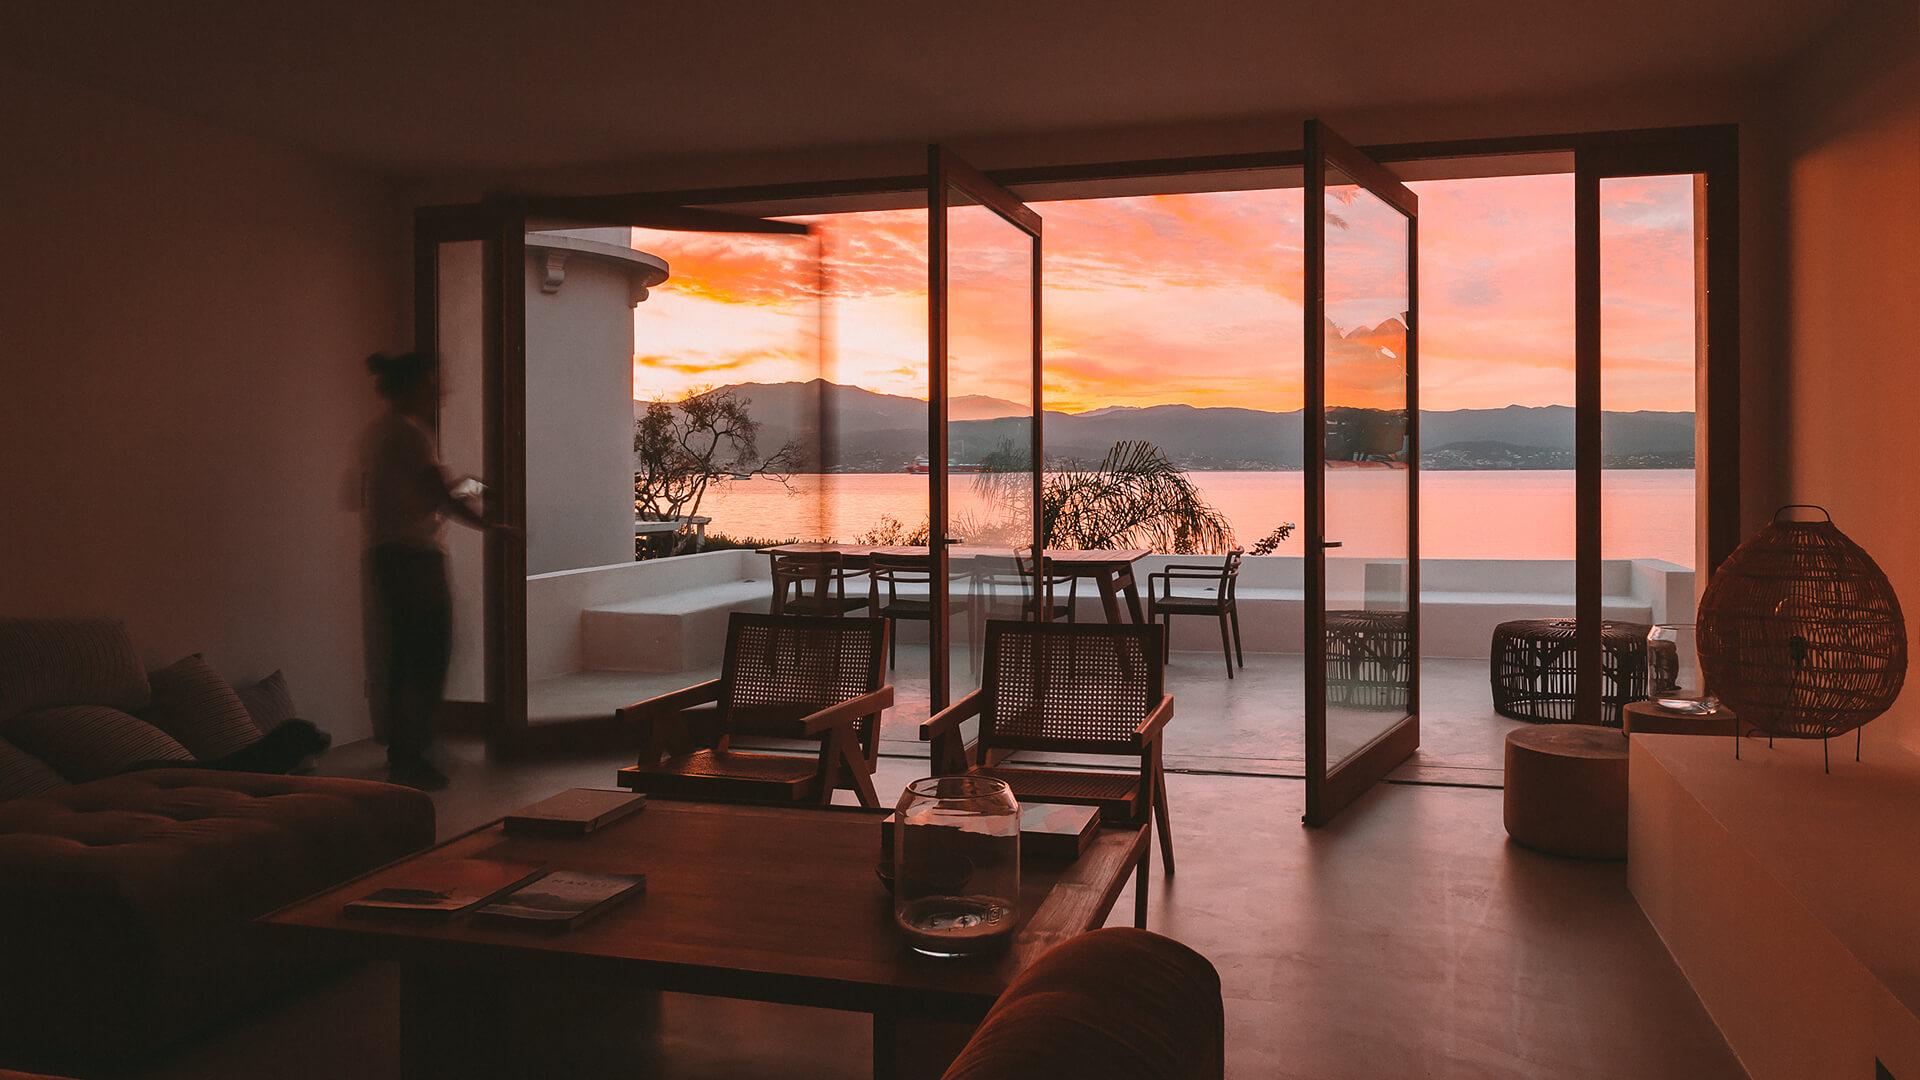 Casa Santa Teresa by Amelia Tavella is a gorgeous Corsican seaside holiday home